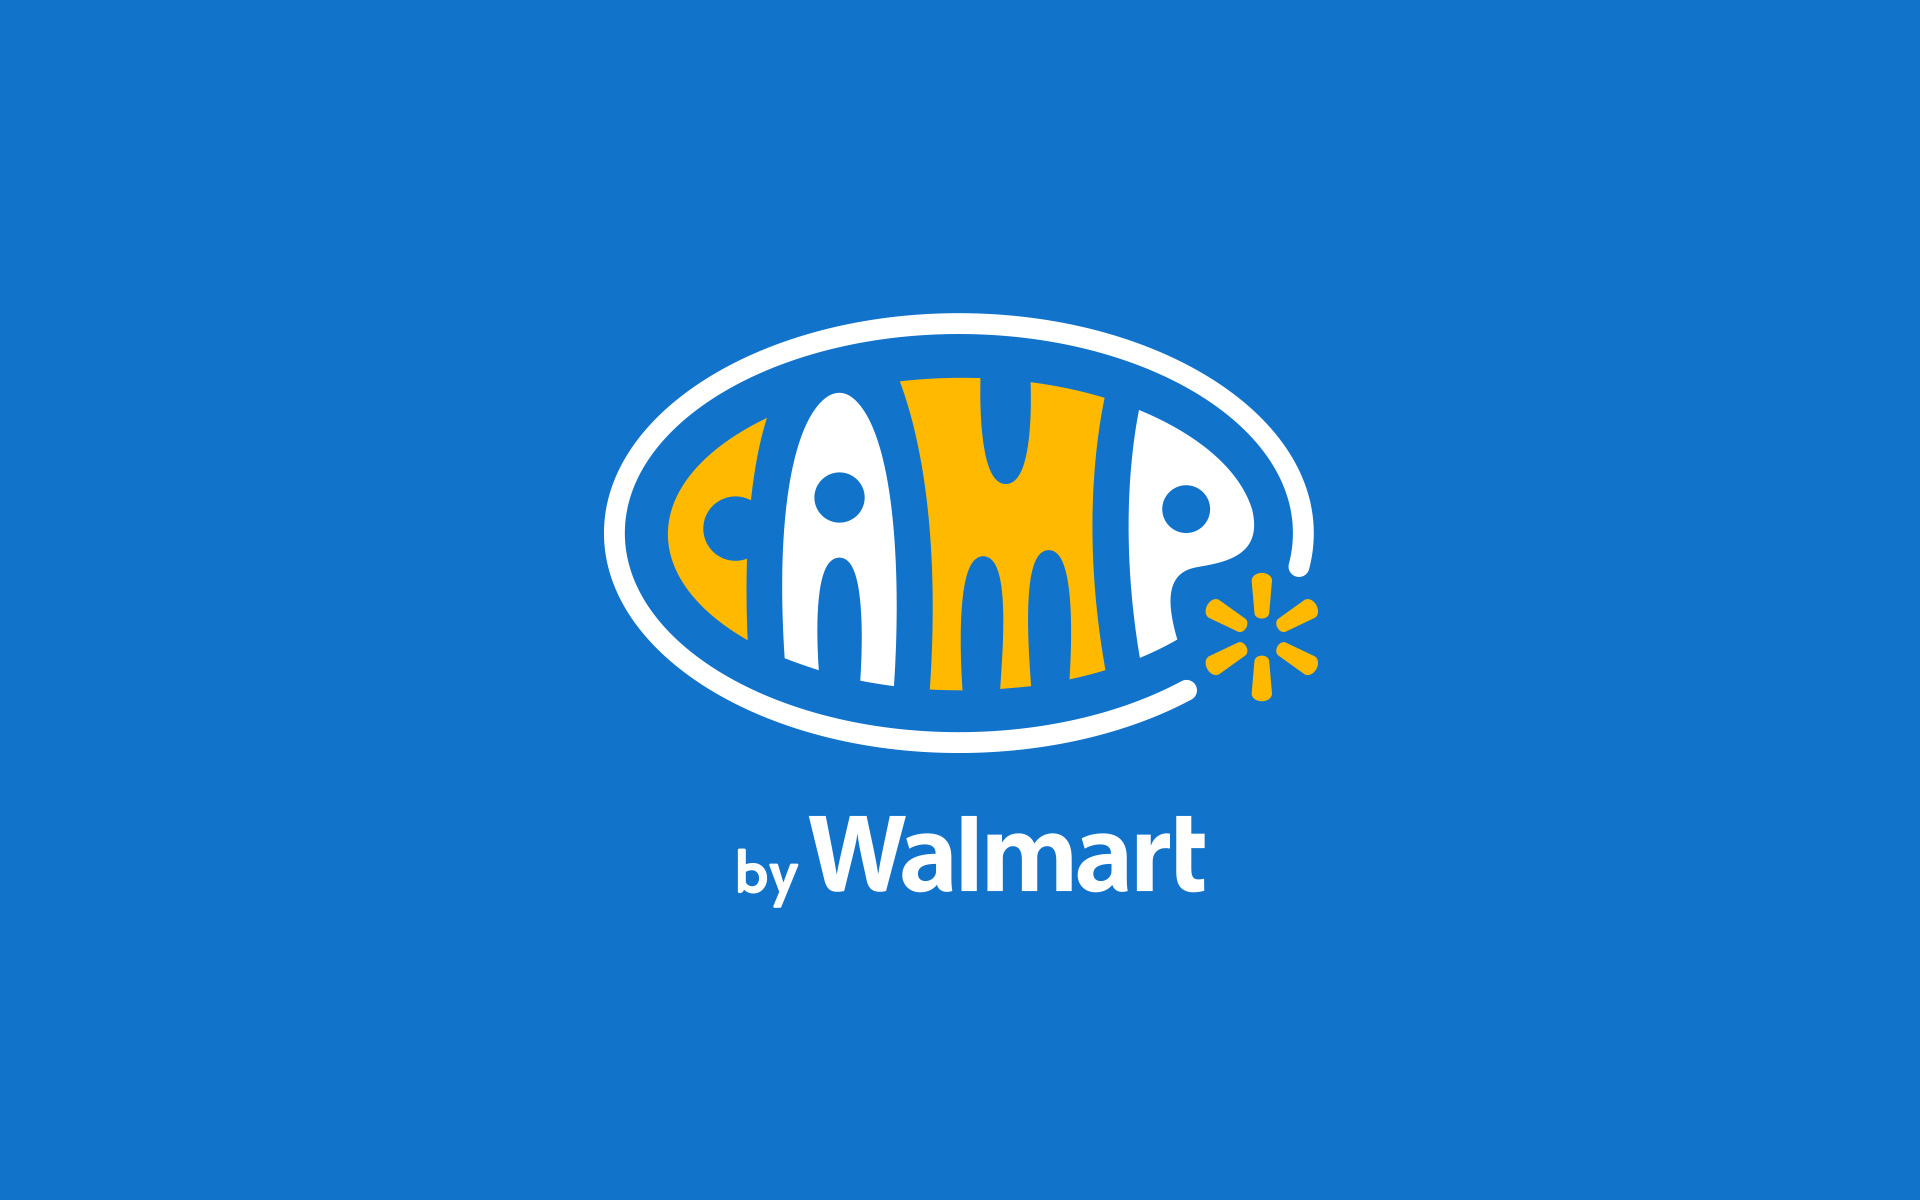 Camp_logo_1